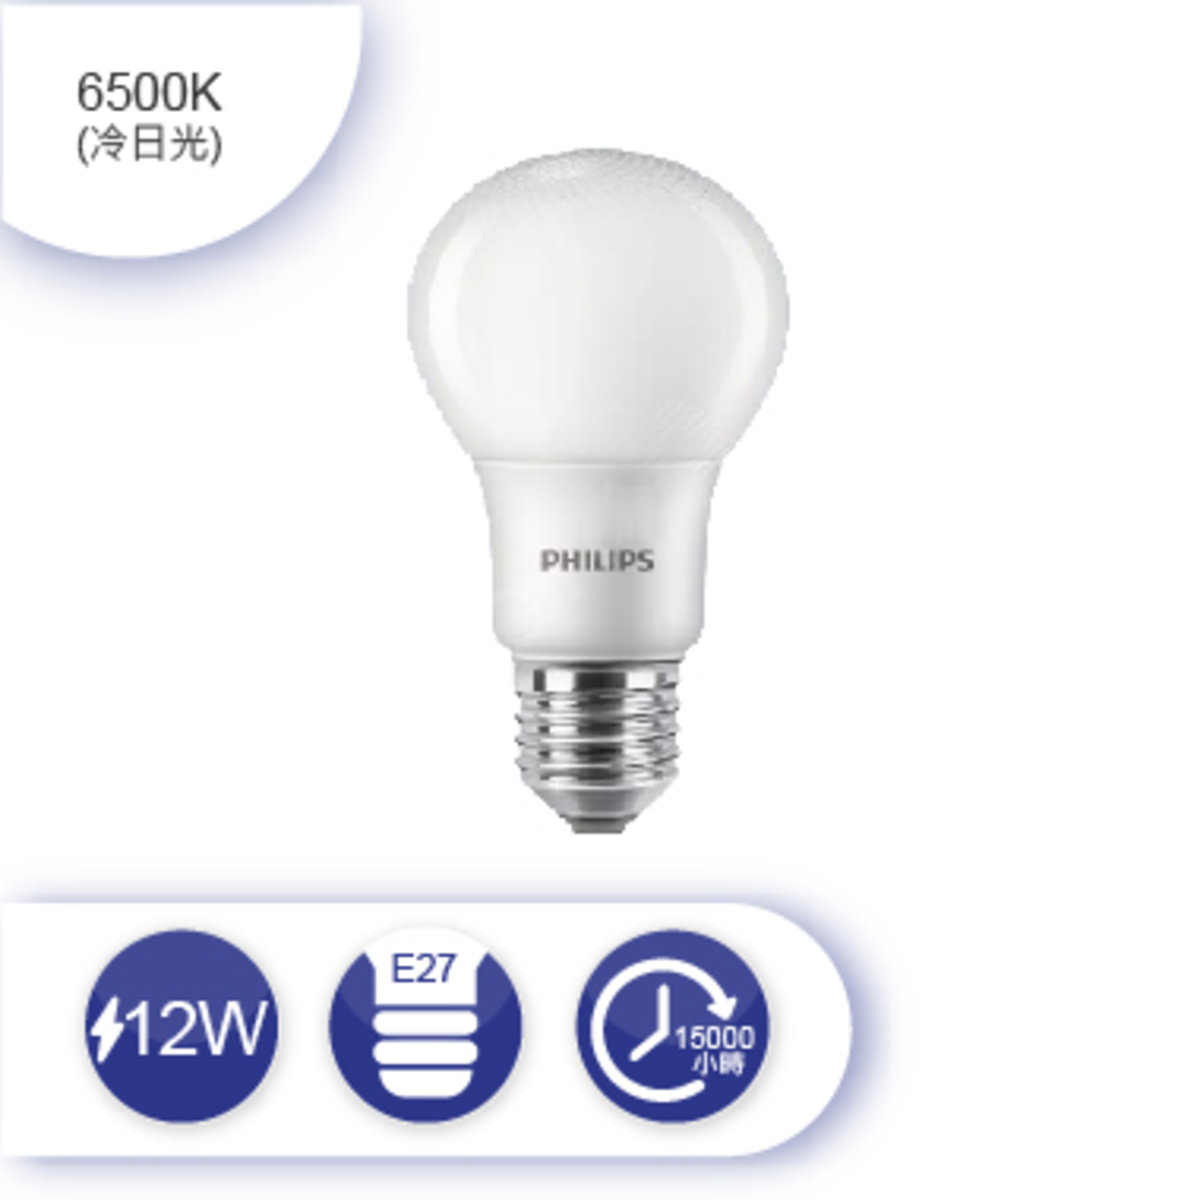 LED燈膽 12W  E27螺頭 冷日光 A60 (最新Gen 8)